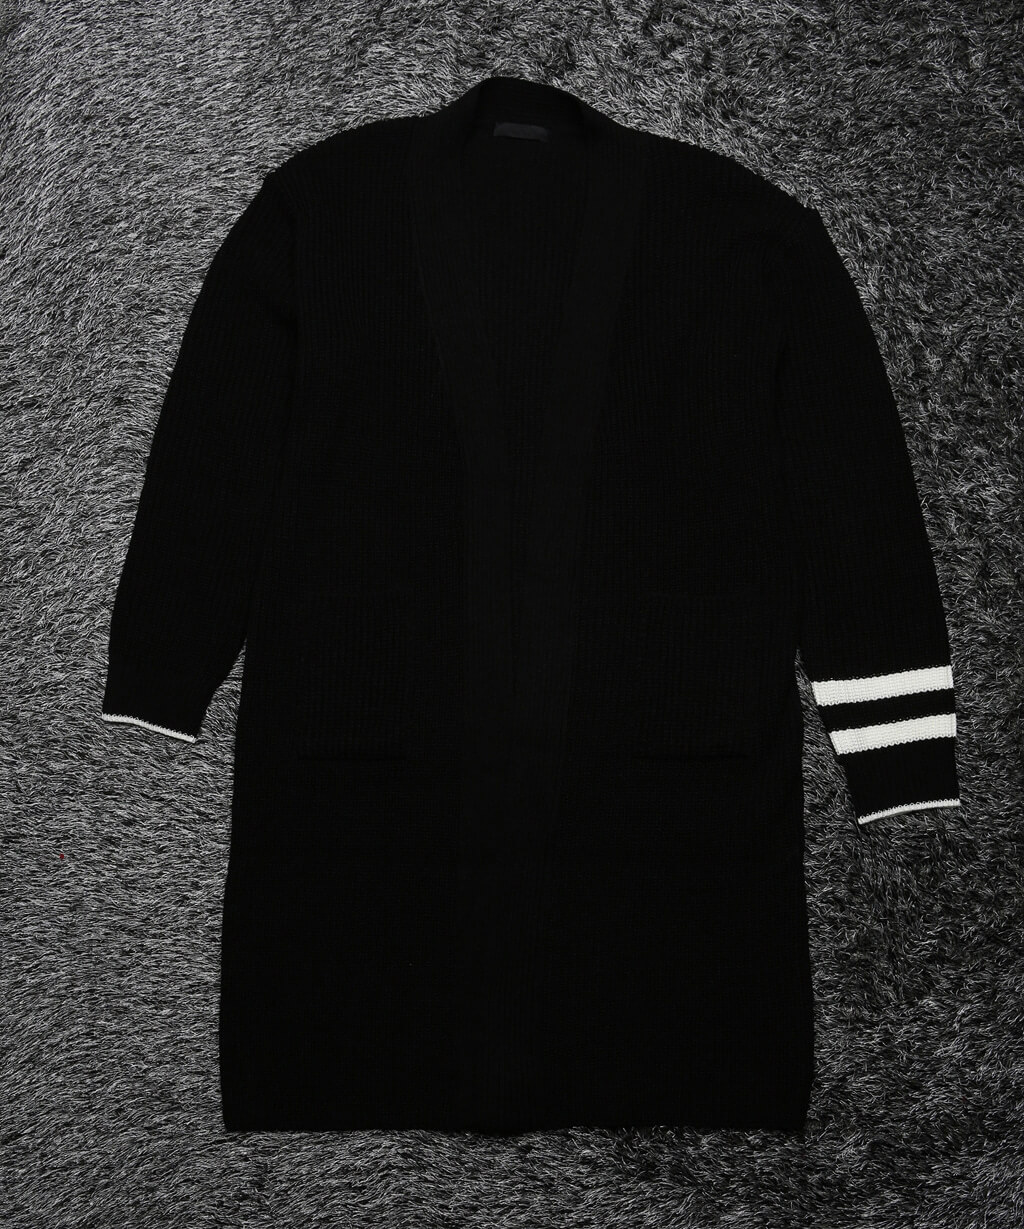 JK-7984